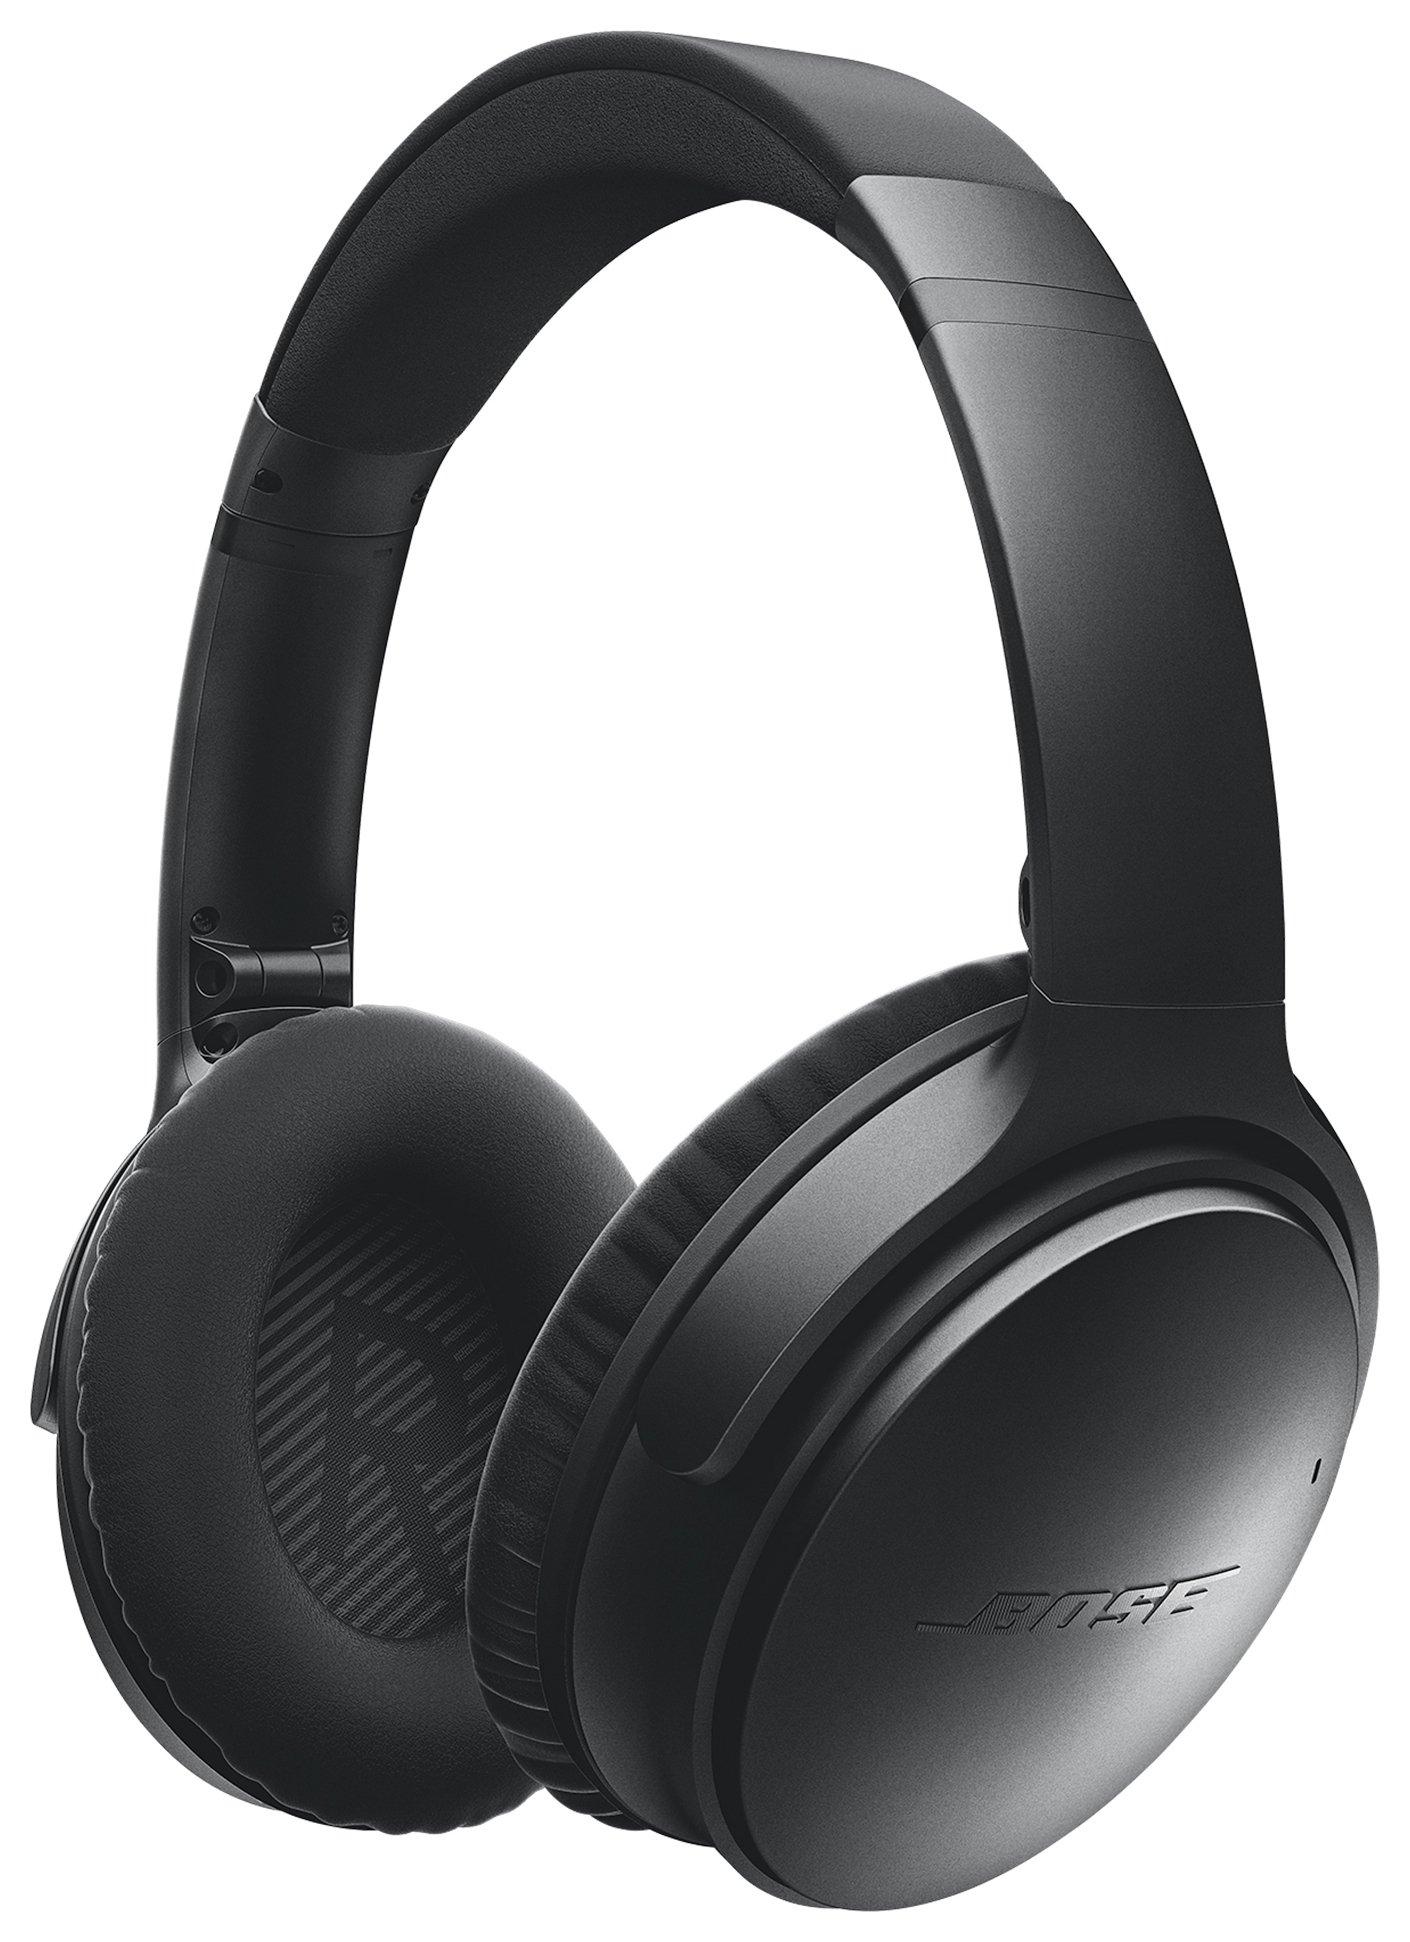 Image of Bose - QuietComfort 35 Wireless Headphones - Black